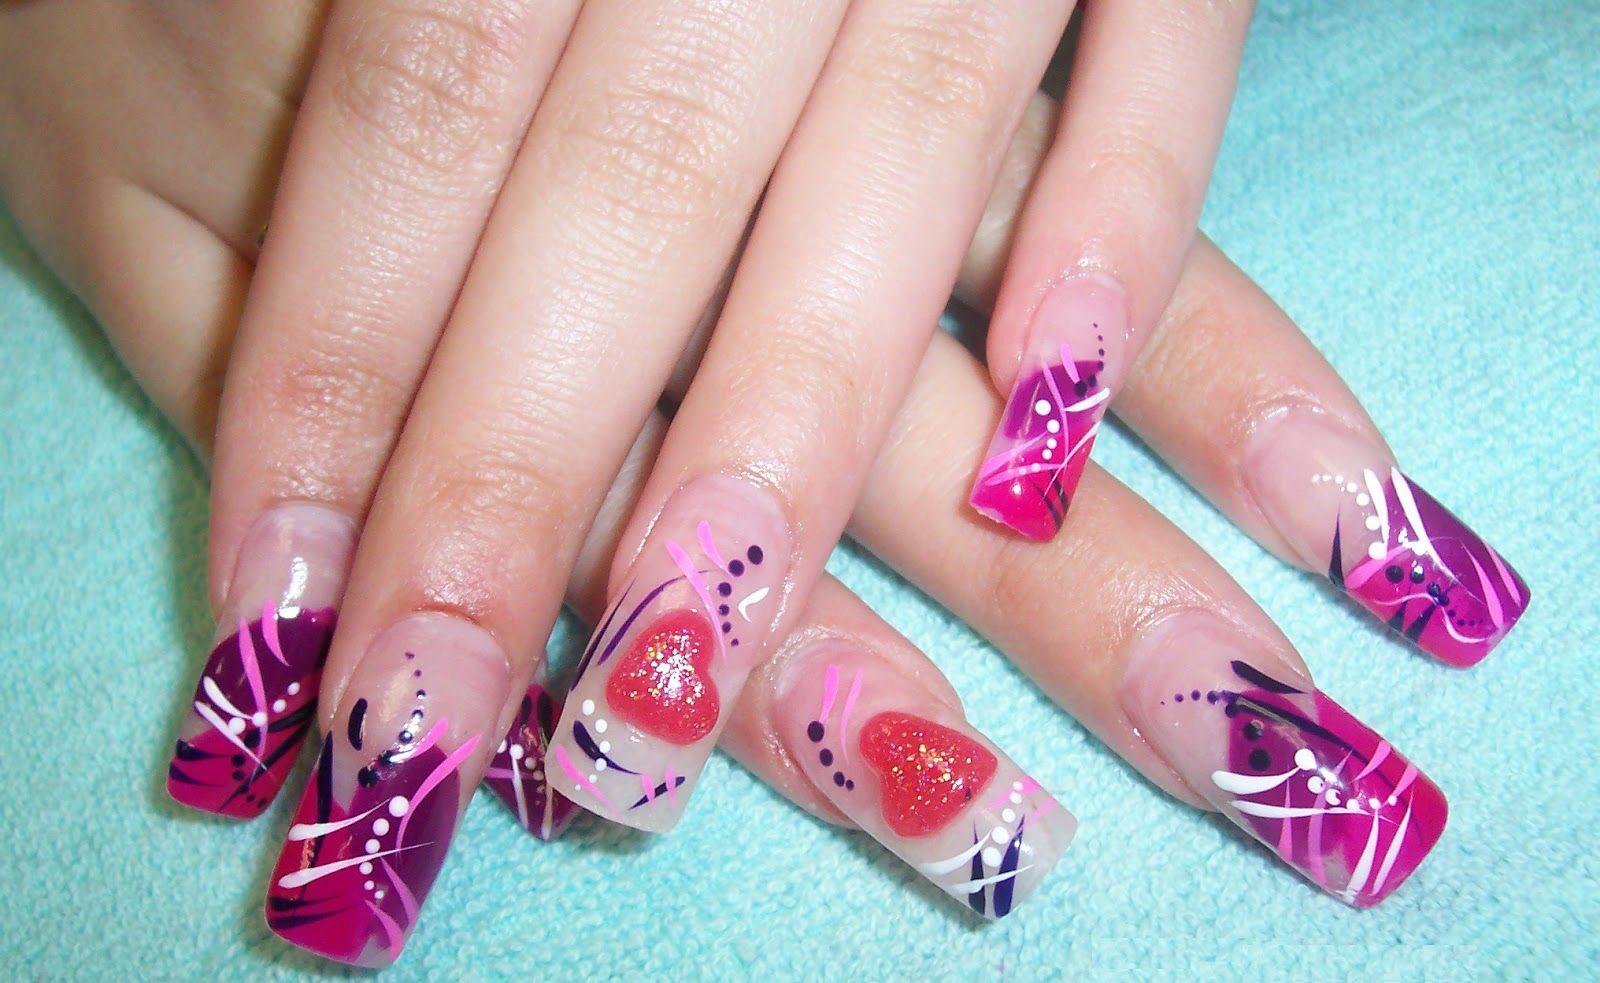 valentinesday3dnailart valentines day nail designs idea 2014